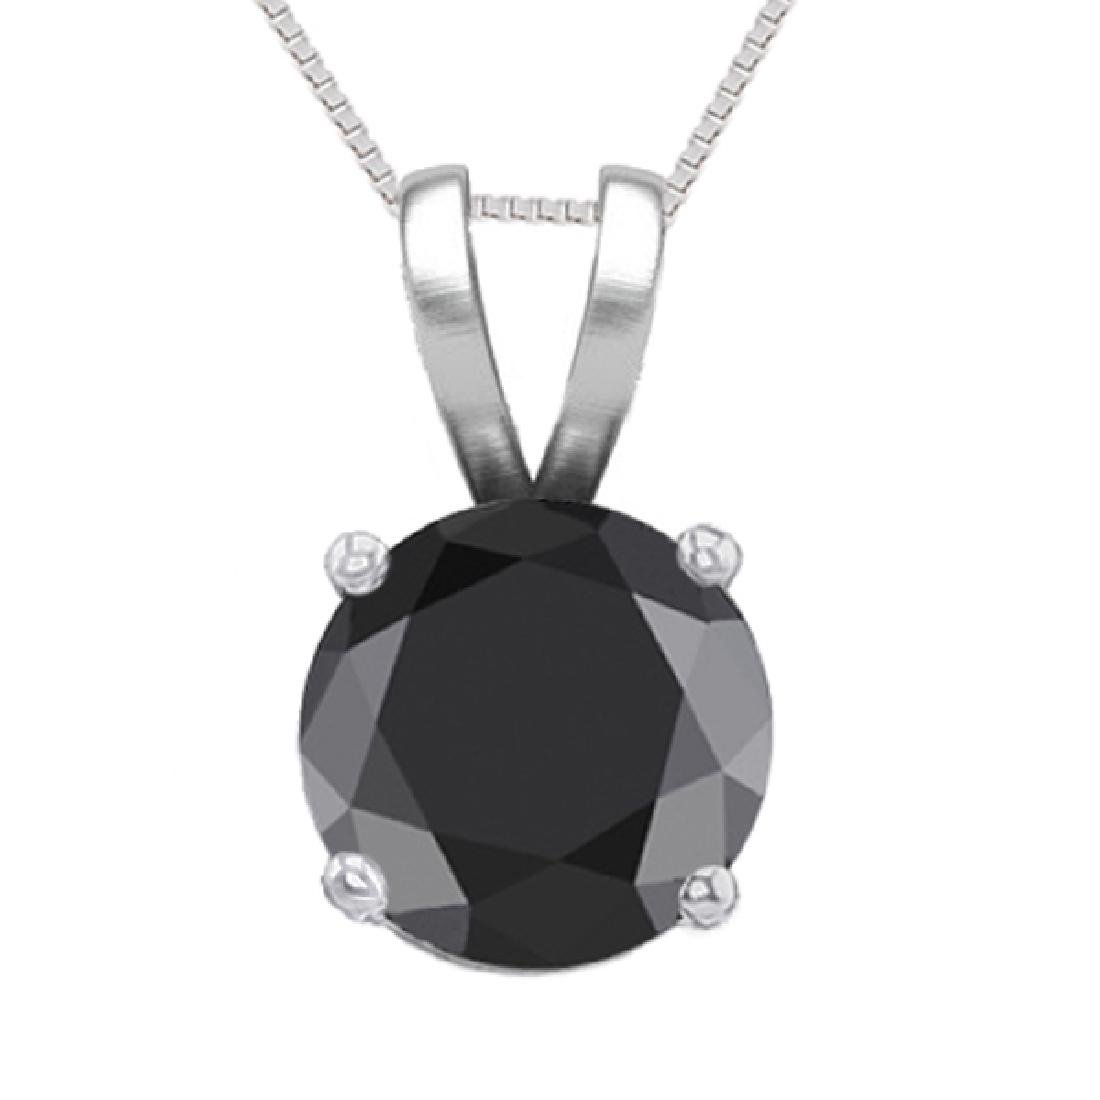 14K White Gold Jewelry 0.52 ct Black Diamond Solitaire